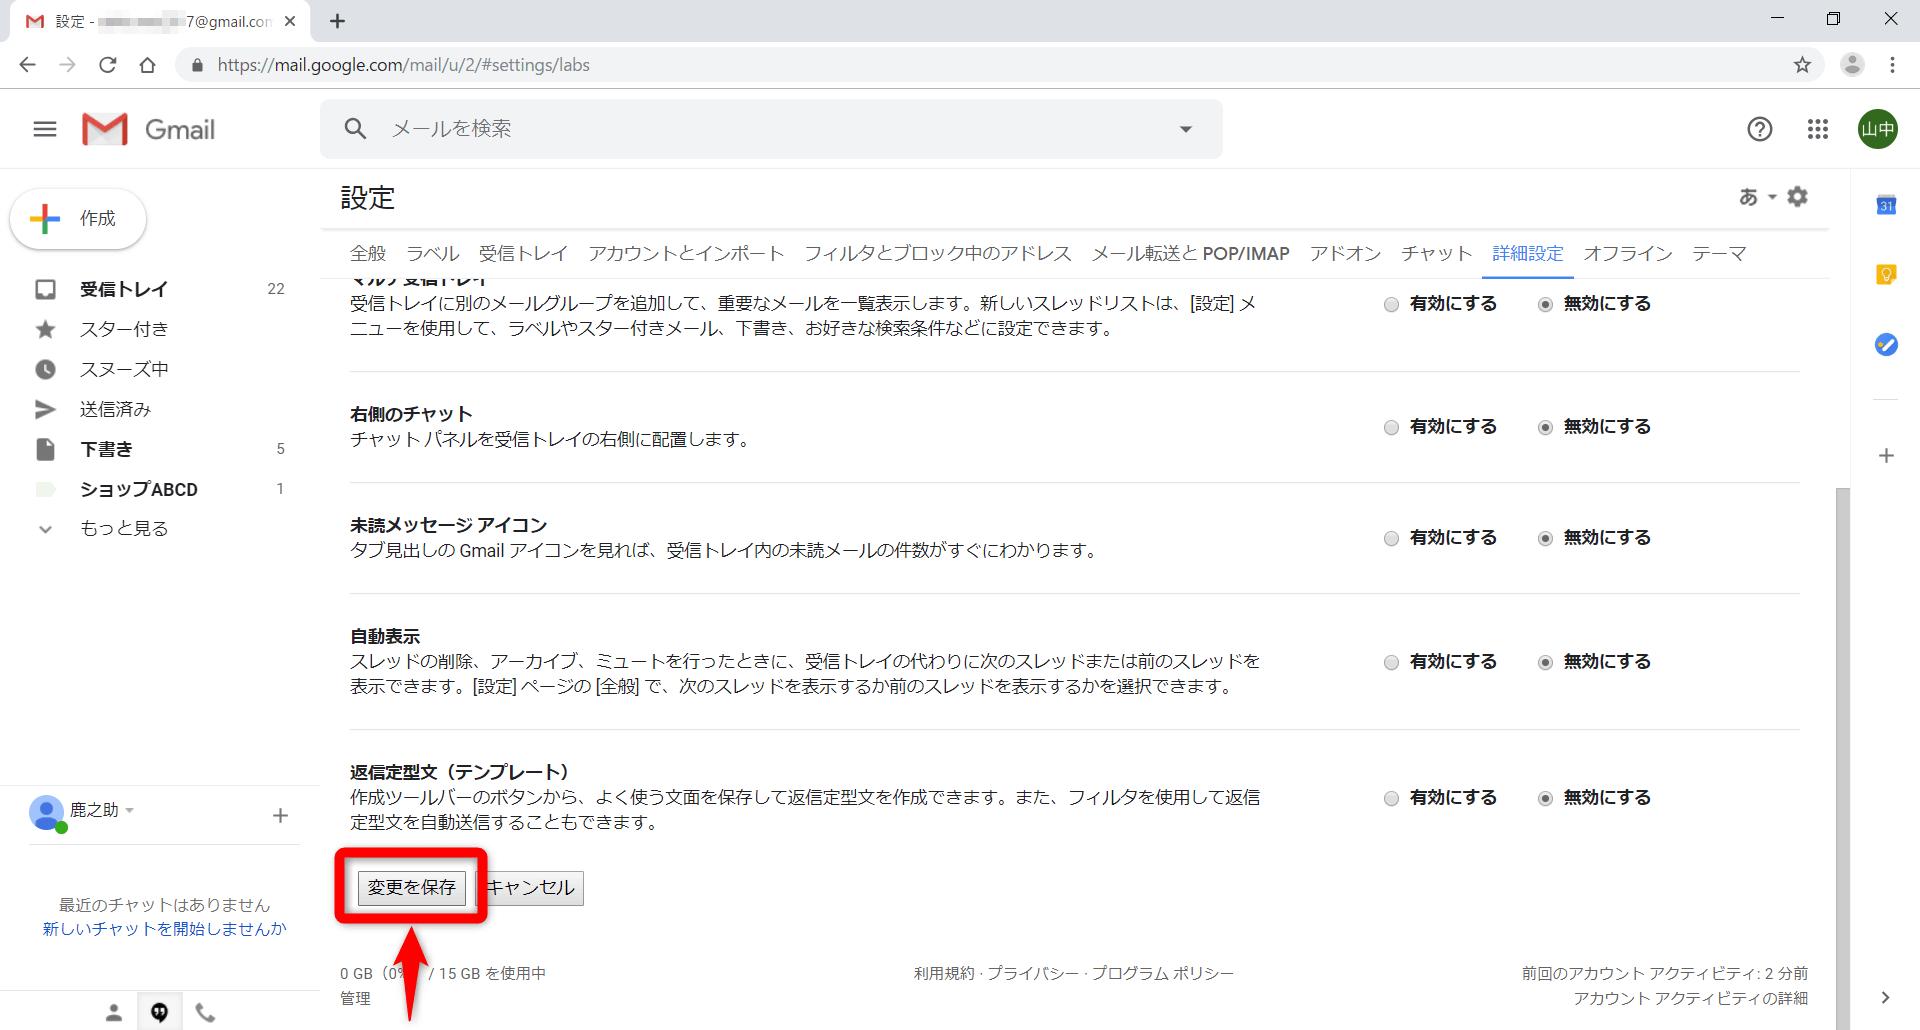 Gmail(ジーメール)の設定画面で変更内容をご存する画面